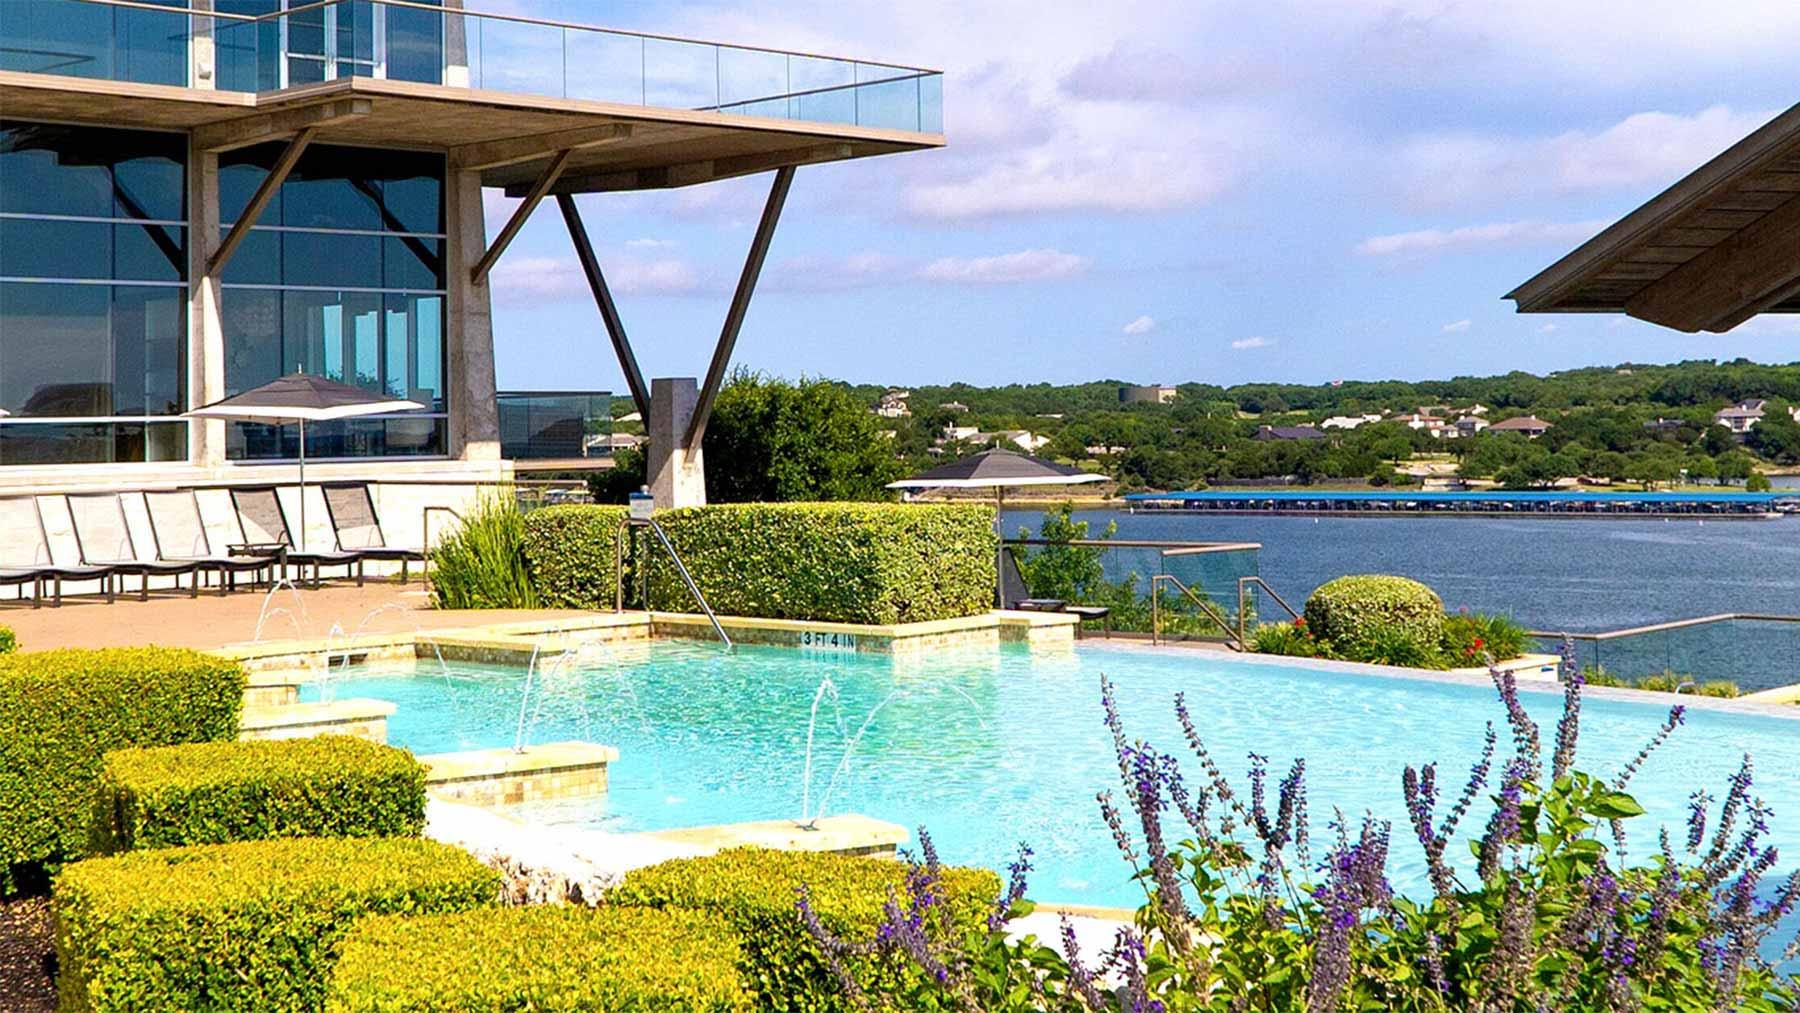 Adult infinity pool at lakeway resort and spa, lakeway